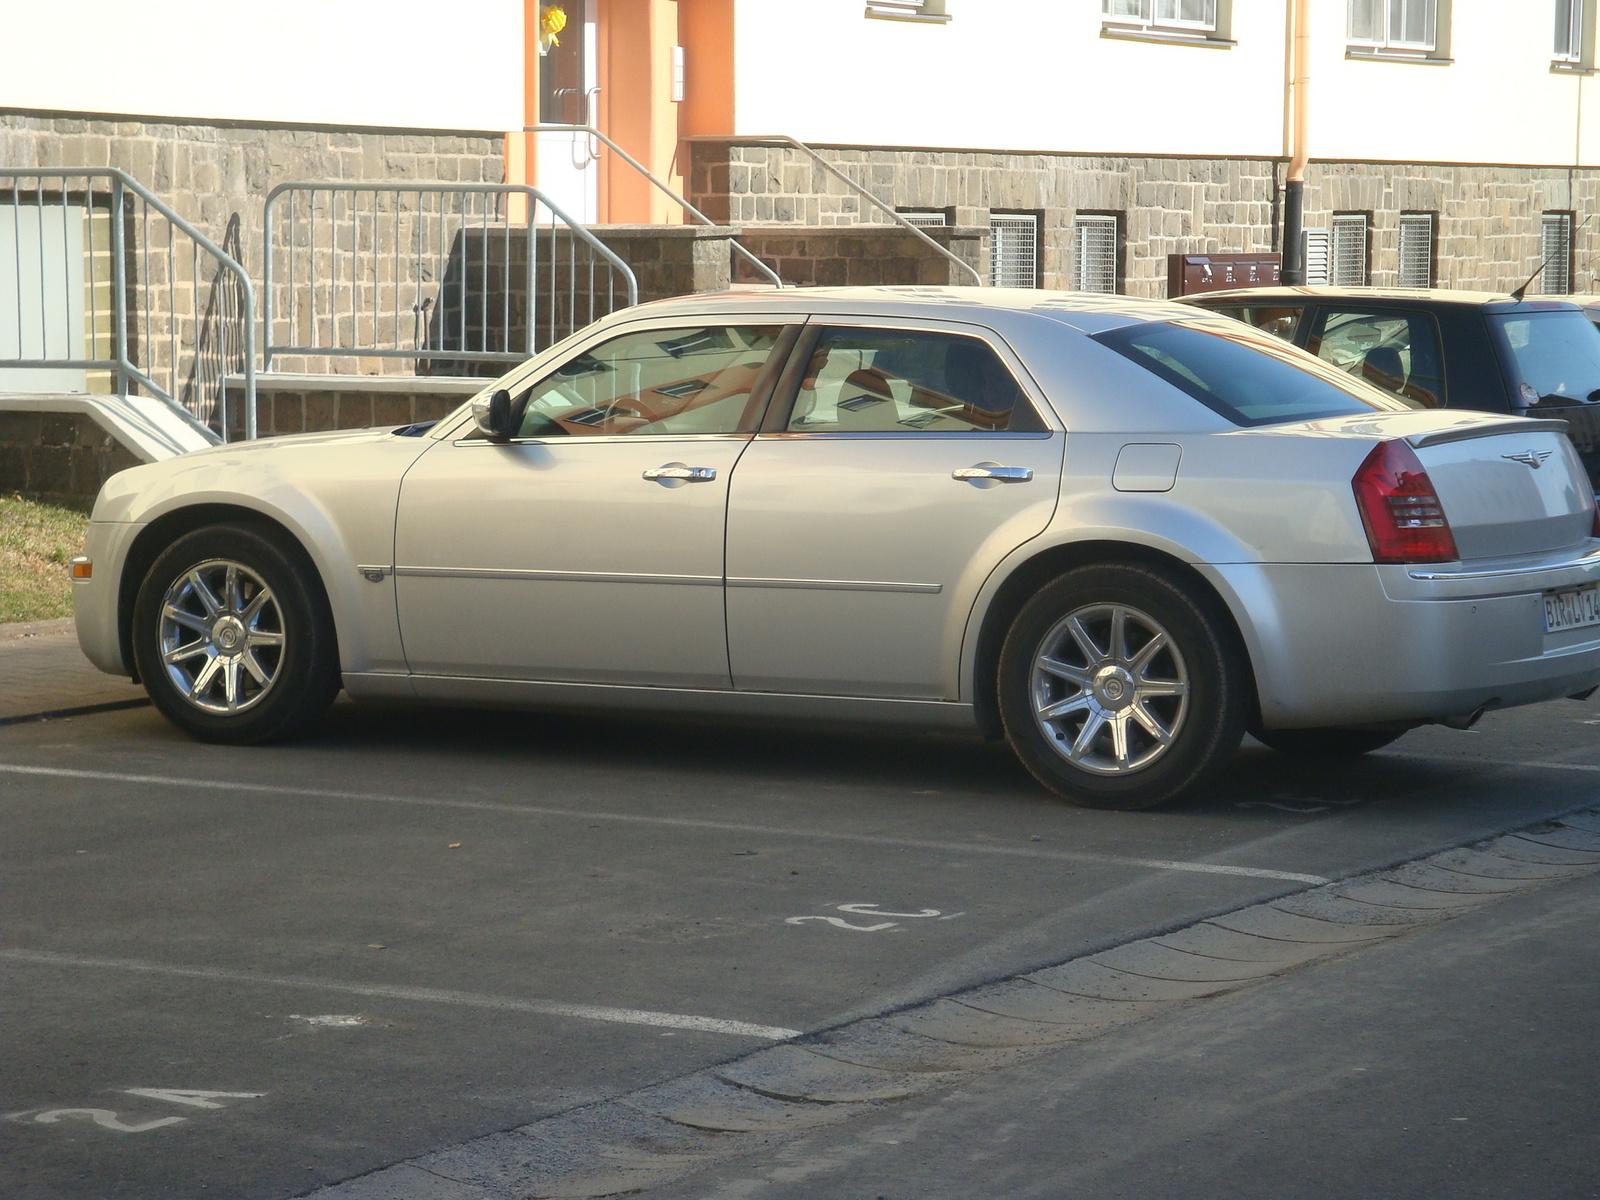 2005 Chrysler 300 Pictures Cargurus